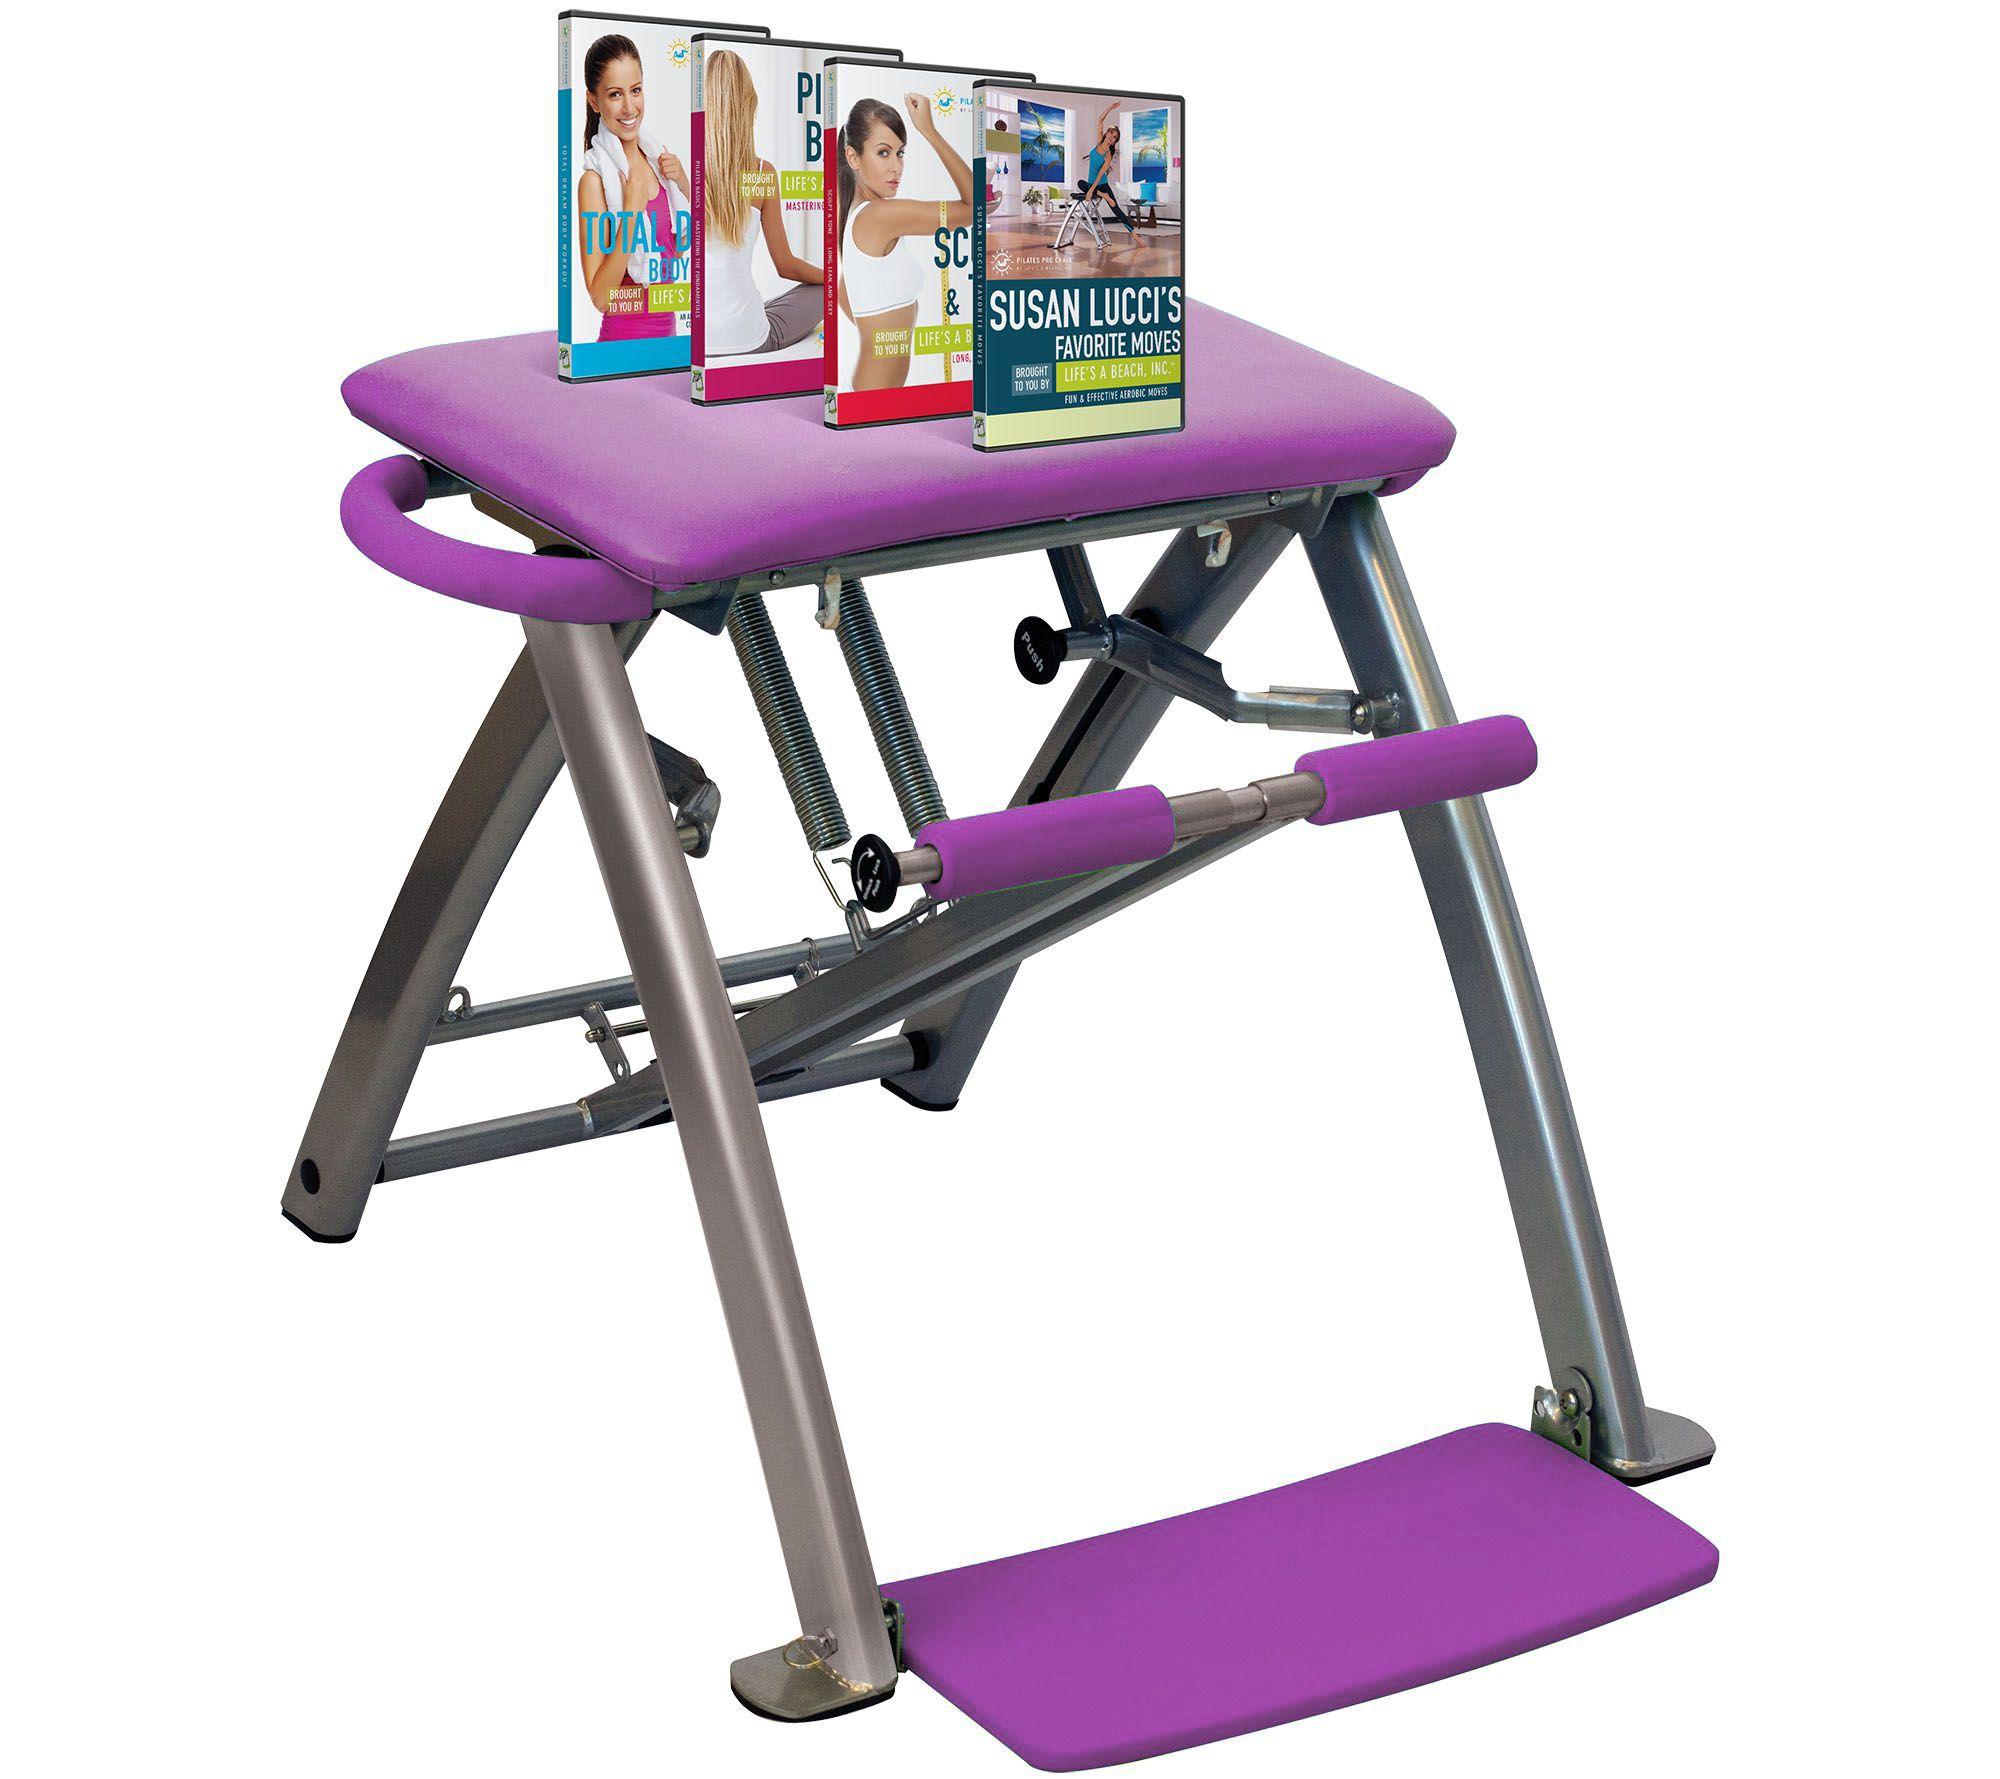 Balanced body pilates chair - Balanced Body Pilates Chair 47